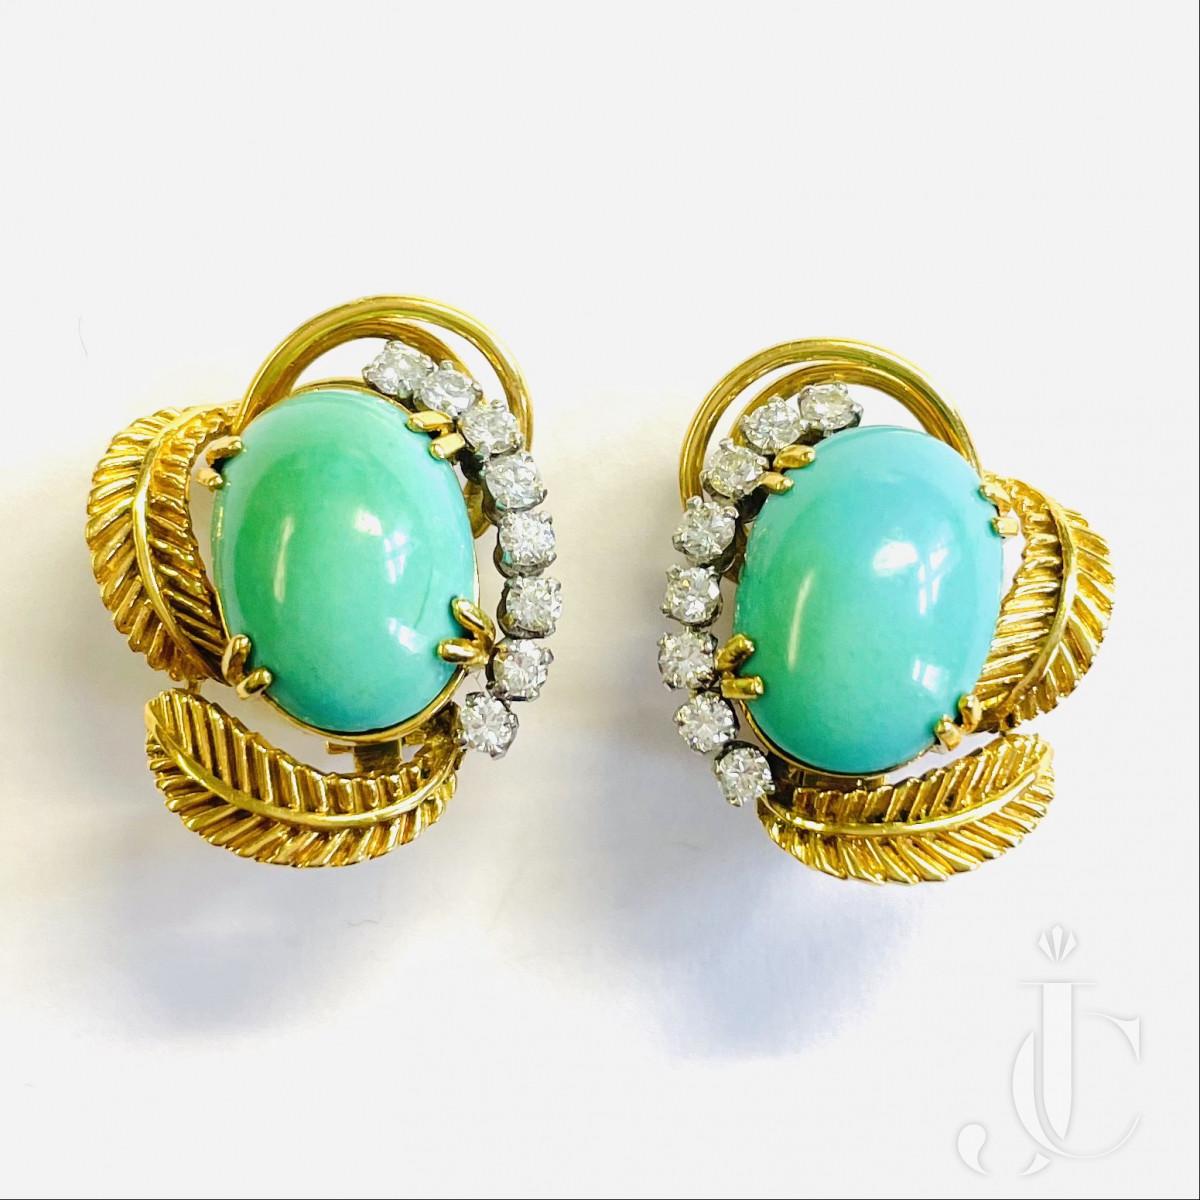 Boucheron Turquoise Ear Clips